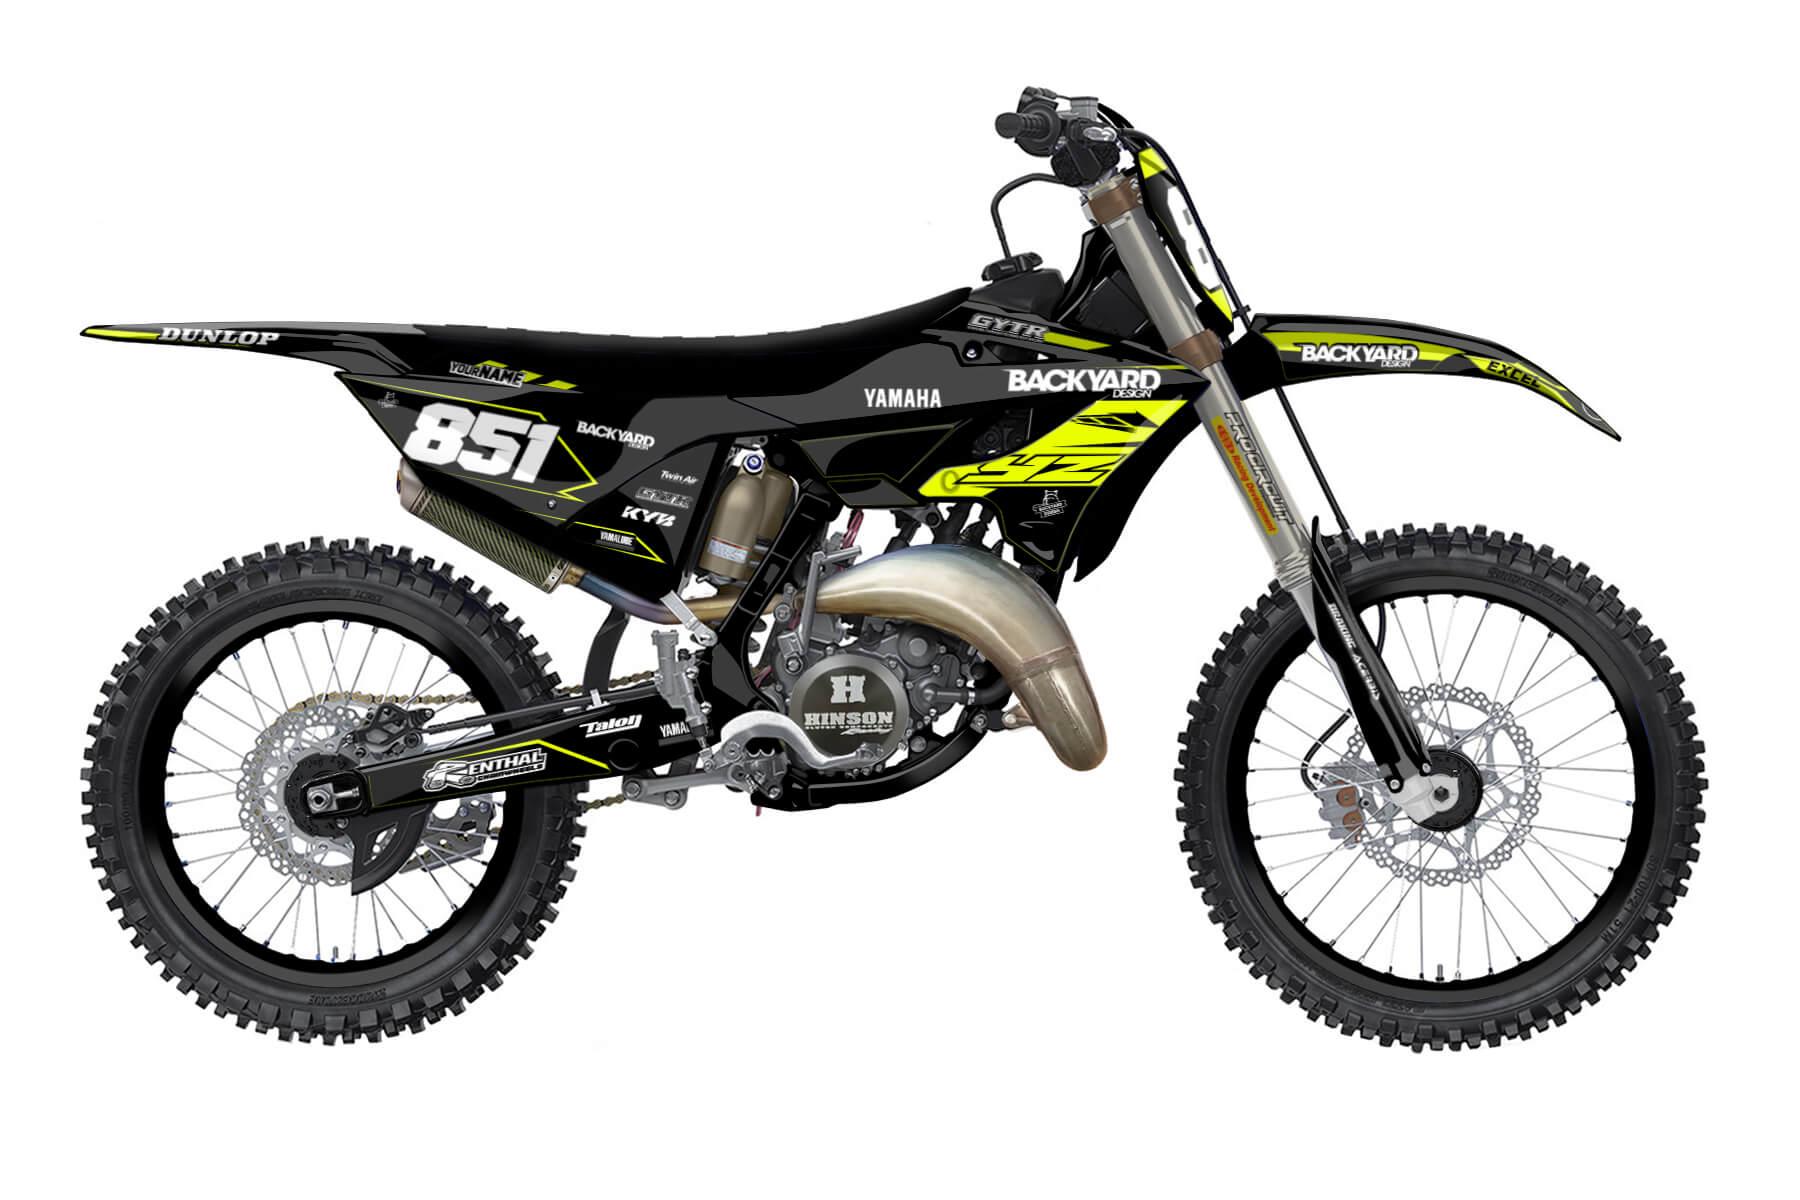 Yamaha YZ 250 - 2022 - Backyard Design - Mx Dekor - Division Neon